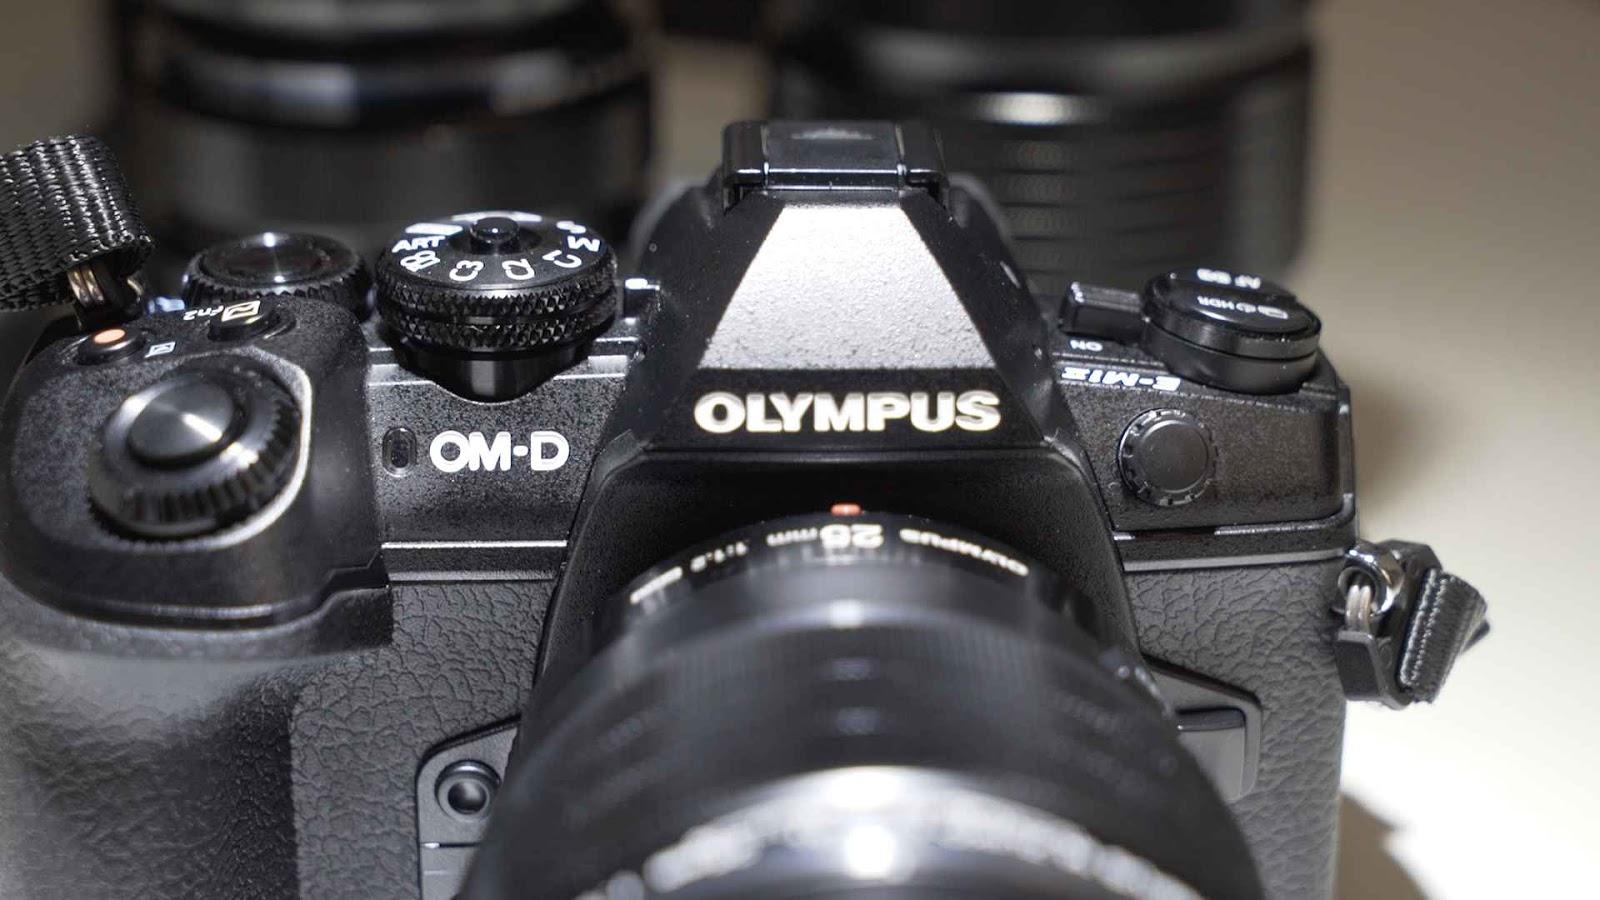 Olympus OM-D E-M1 Mark II